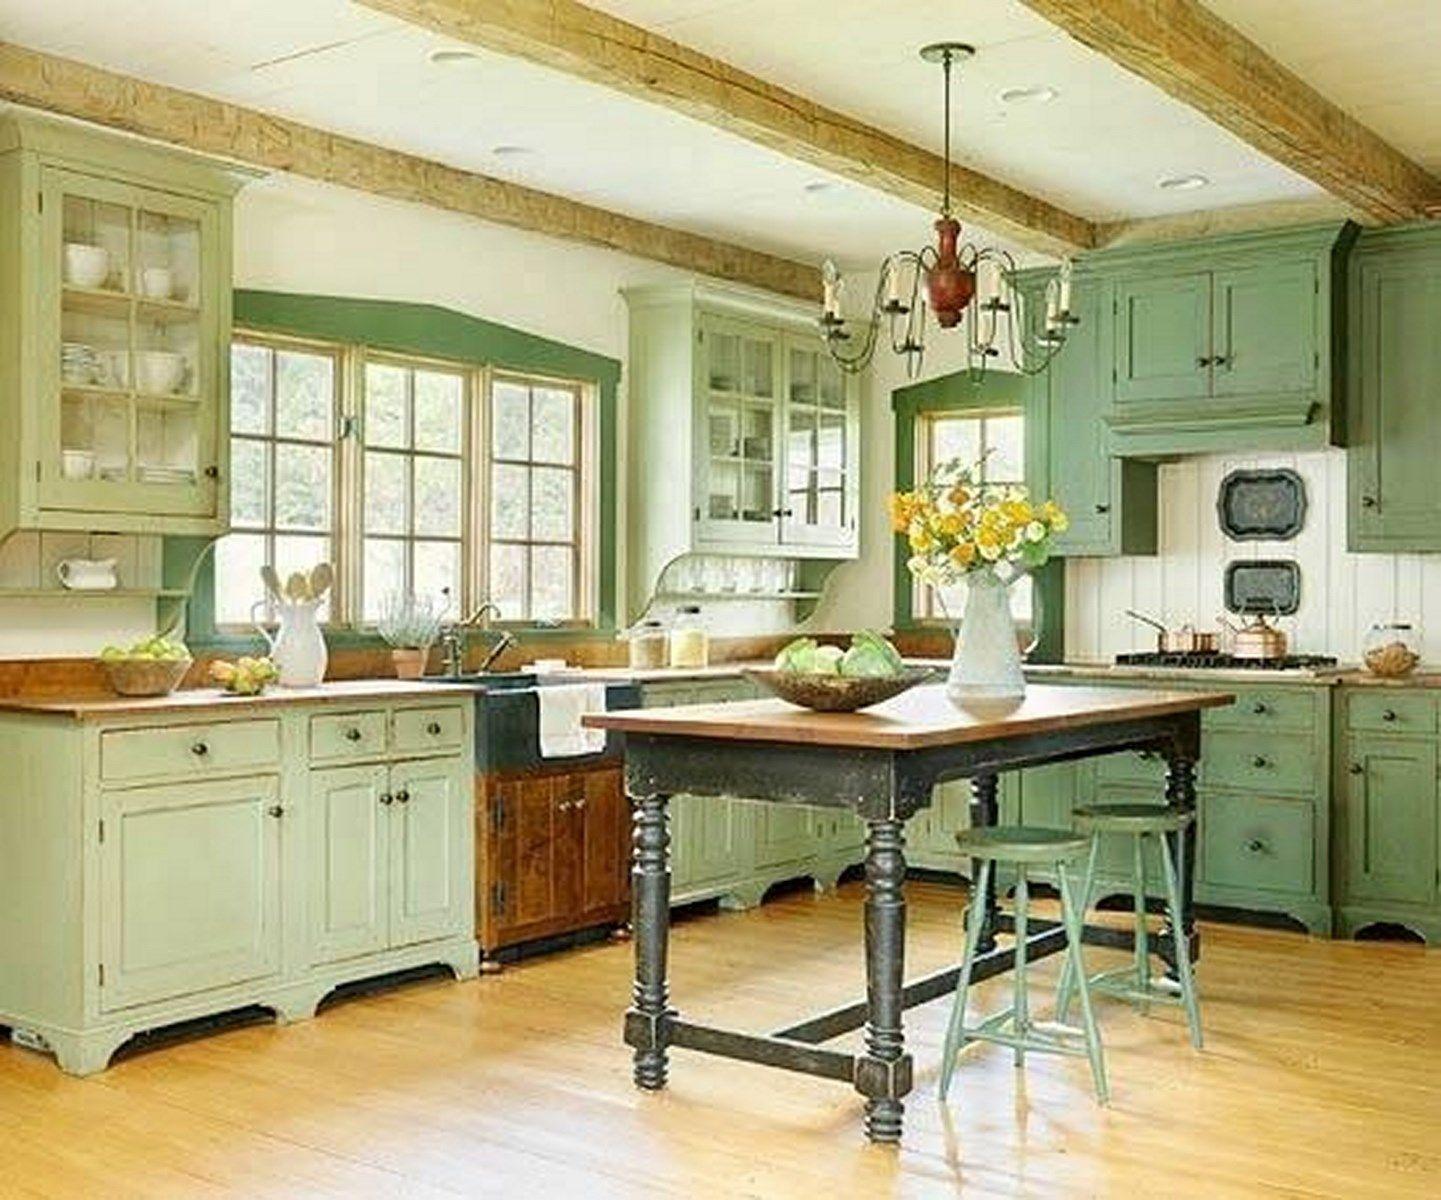 15 Cheery Green Kitchen Design Ideas Rilane We Aspire To Inspire Modern Farmhouse Kitchens Green Kitchen Designs Home